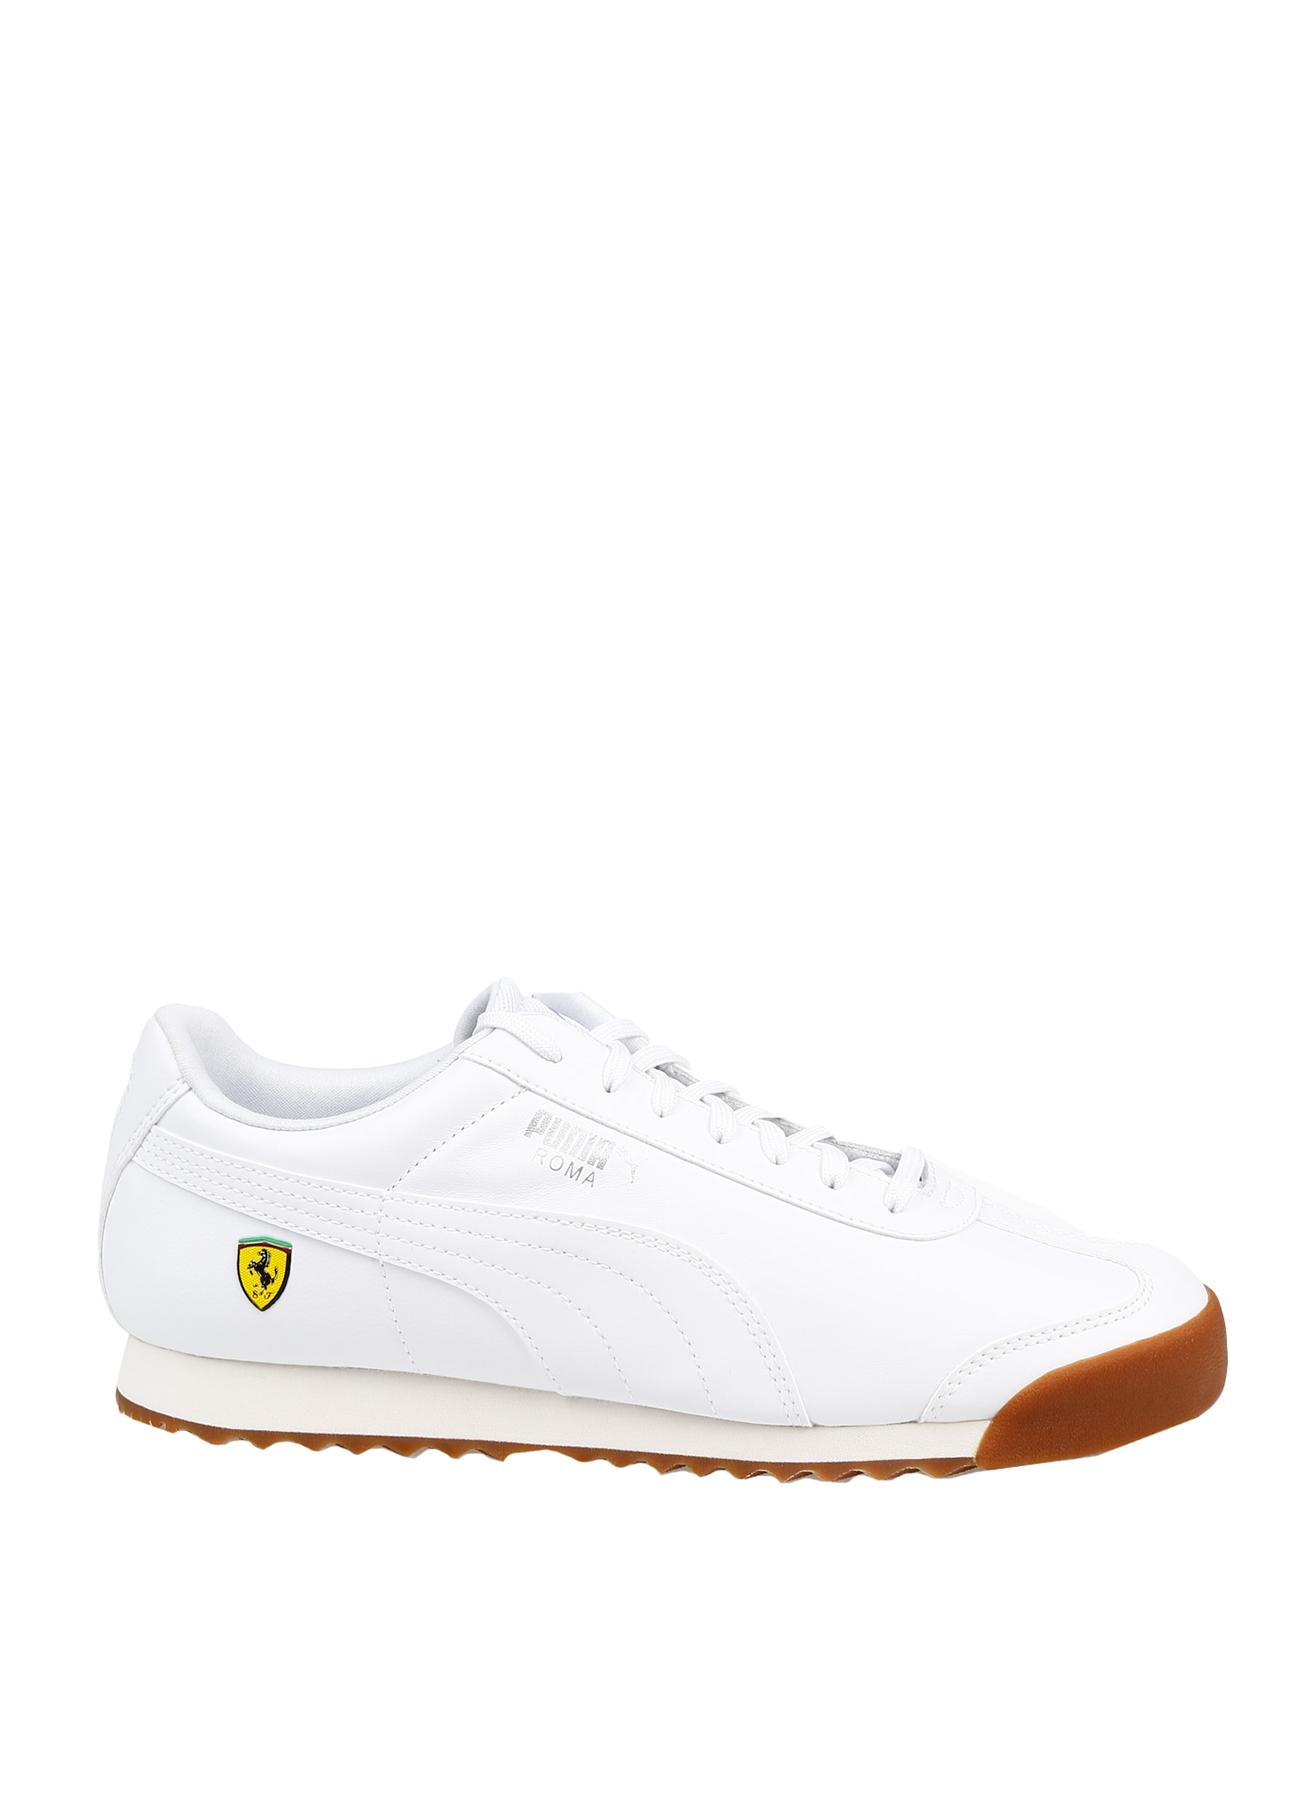 Puma SF Roma Lifestyle Ayakkabı 44.5 5001632593008 Ürün Resmi